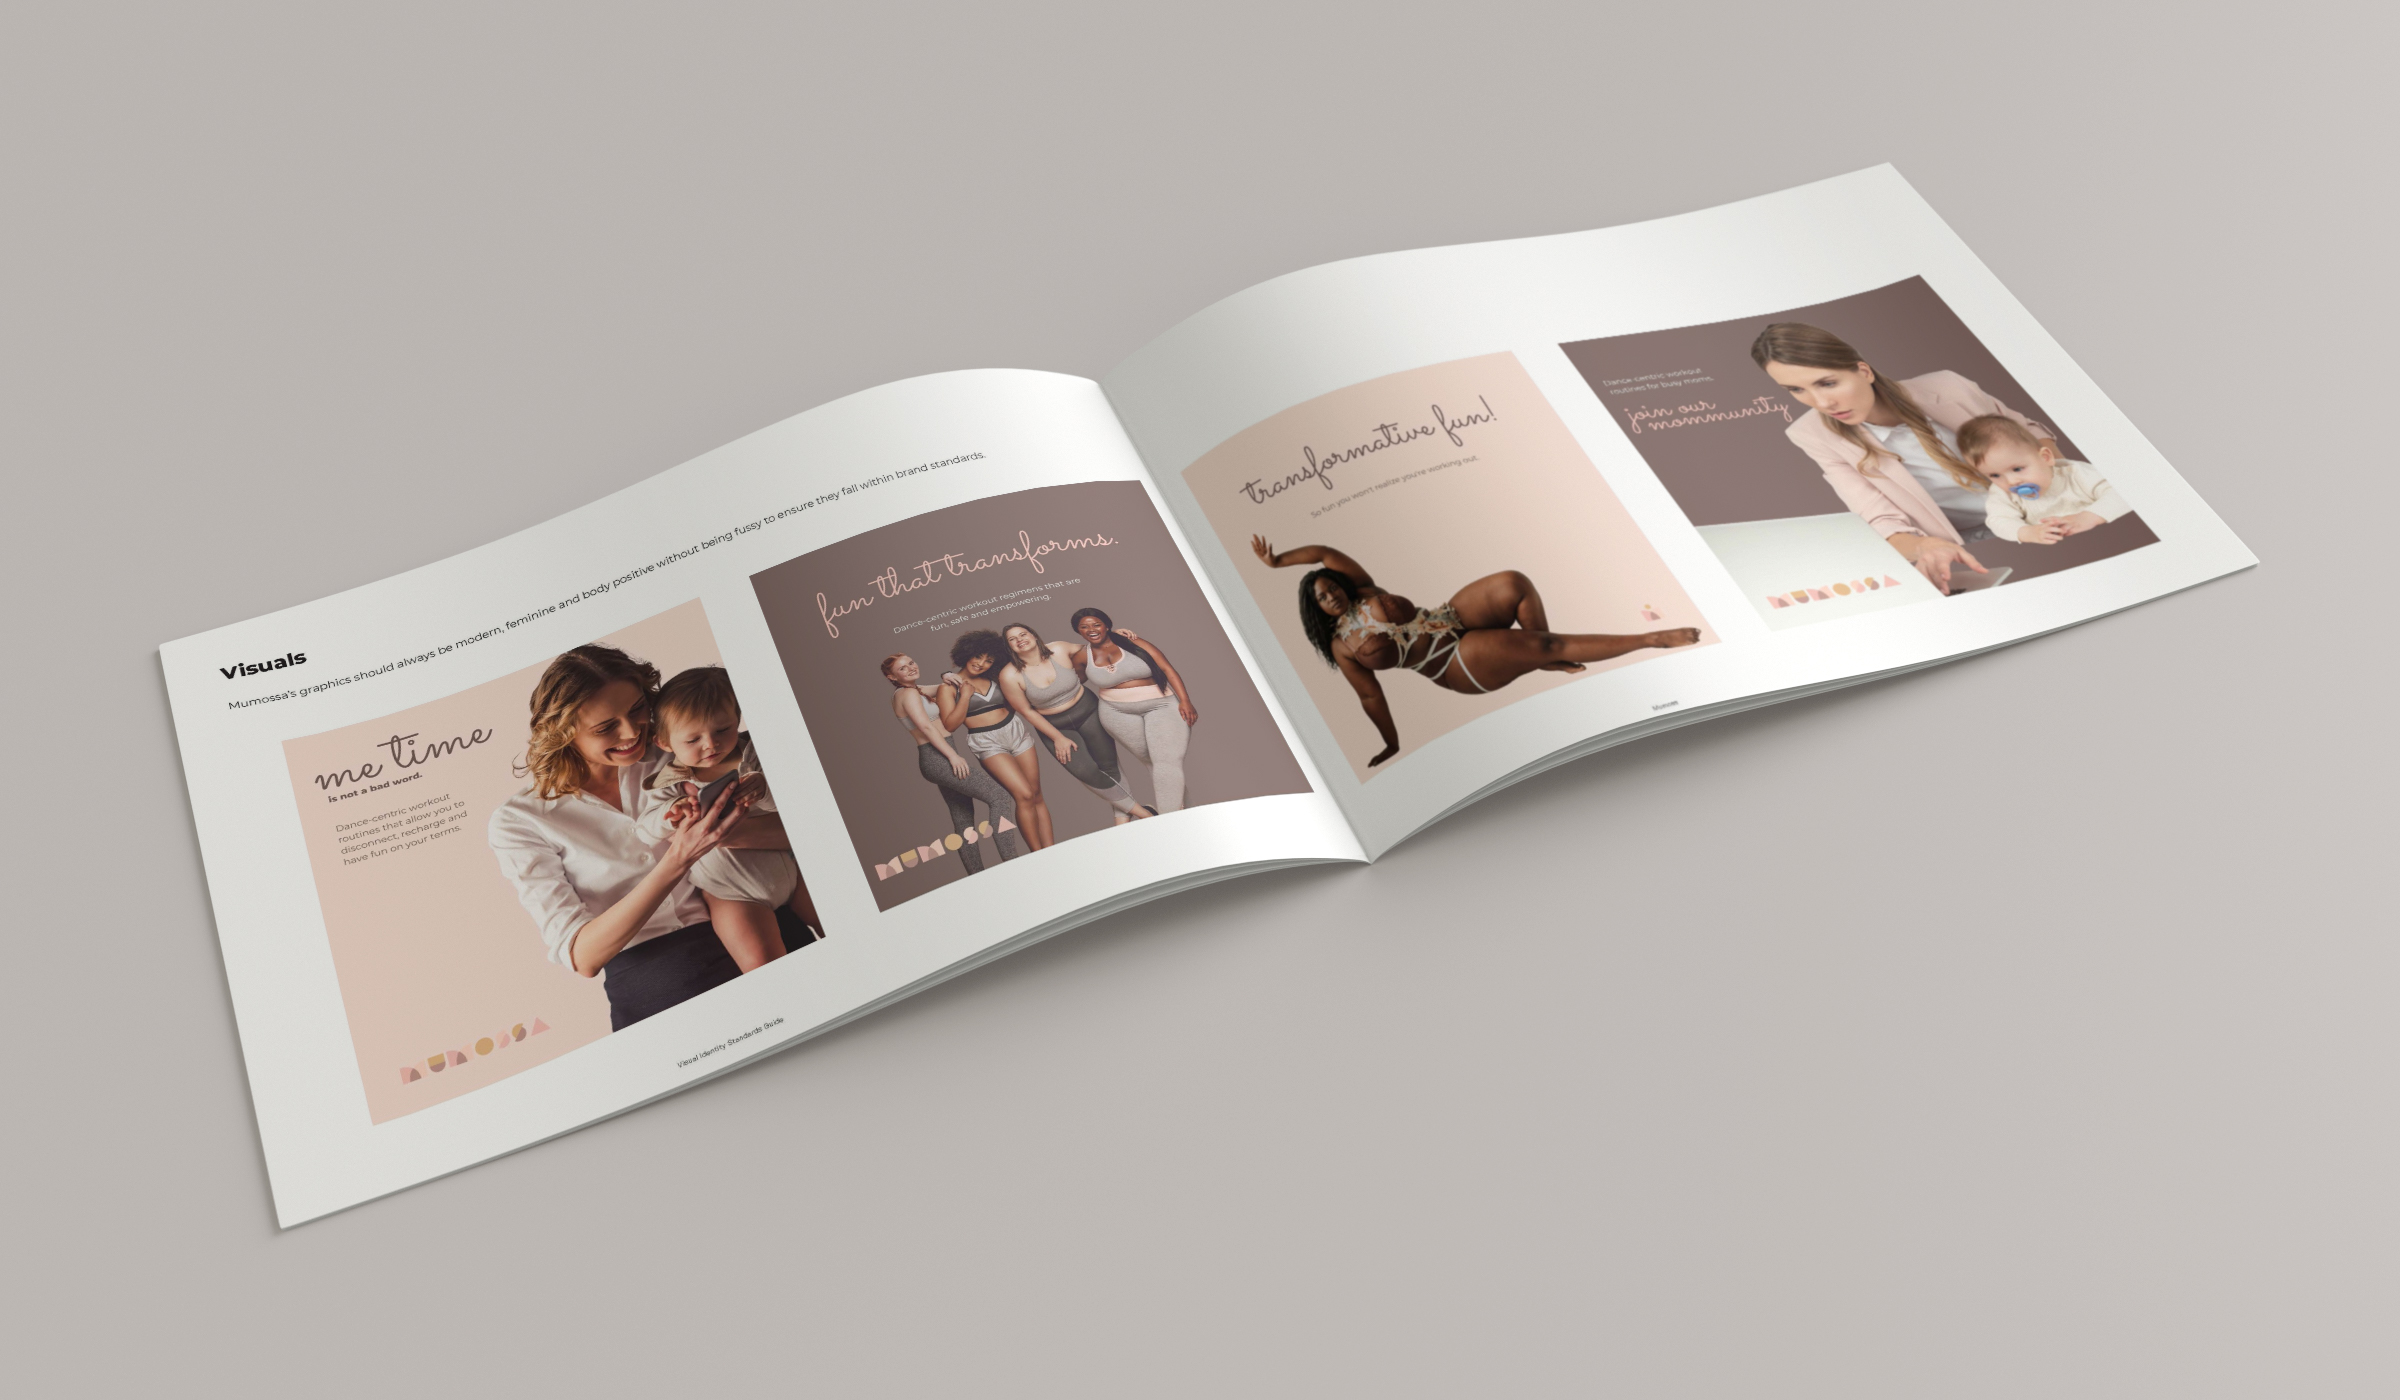 mumossa brand guide visuals and mockups